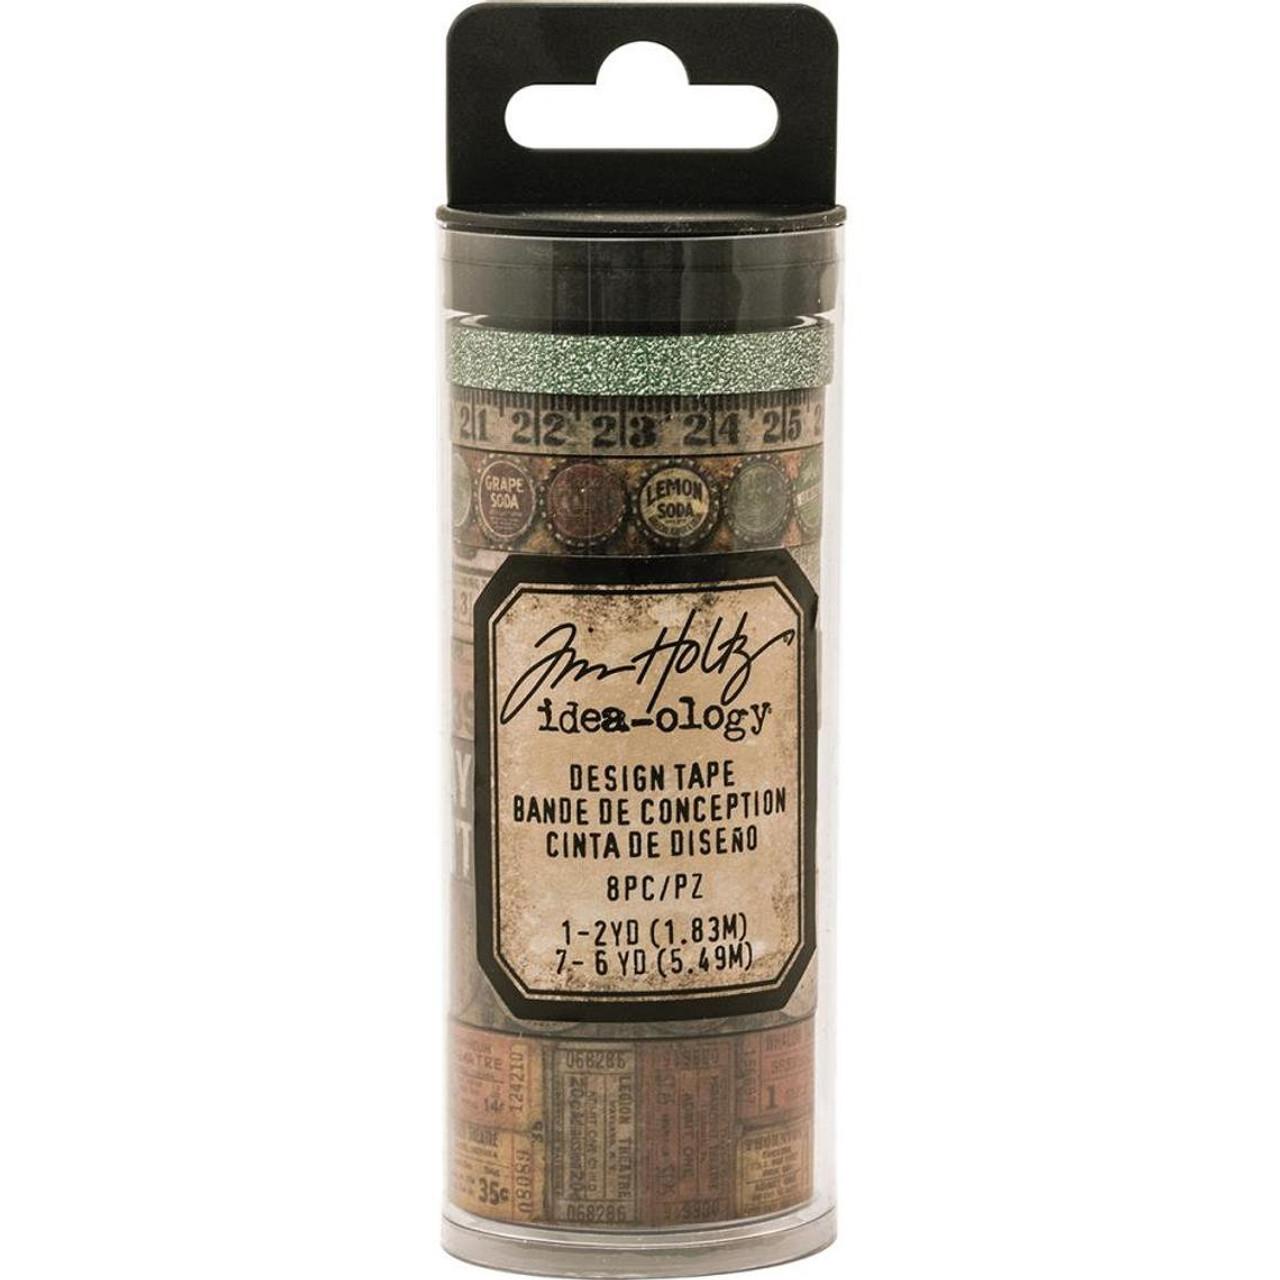 Vintage Idea-Ology Design Tape 8/Pkg - Washi Tape Set for Bible Journaling and Crafting by Tim Holtz